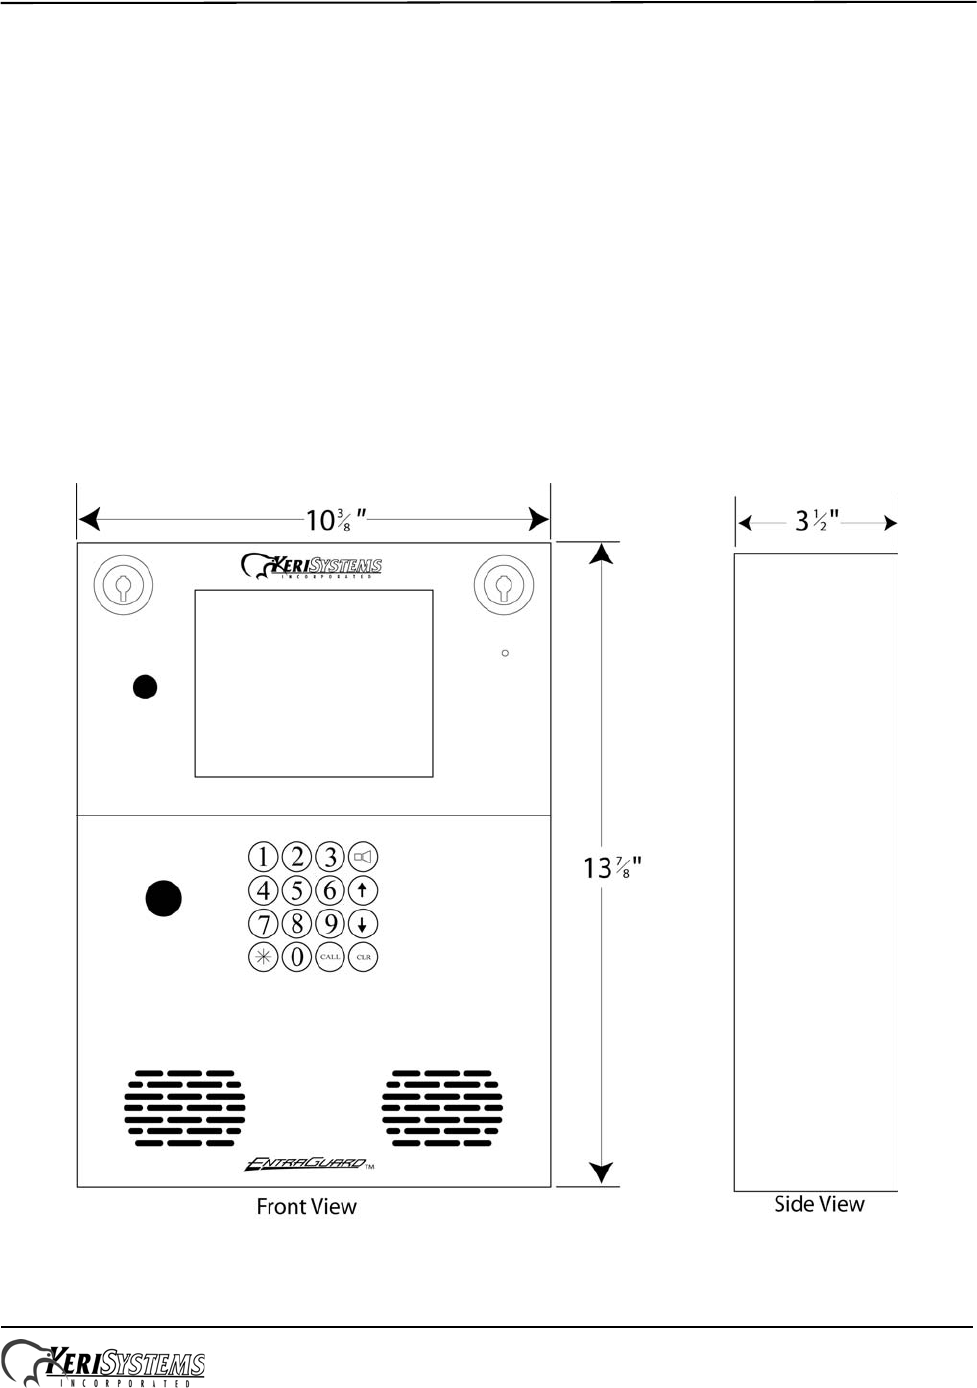 [DIAGRAM_4PO]  Keri Systems EntraGuard_Platinum_Quick_Start_Guide Entra Guard Platinum  Telephone Entry Controller Quick Start Guide Entraguard | Keri Access Wiring Diagram |  | UserManual.wiki